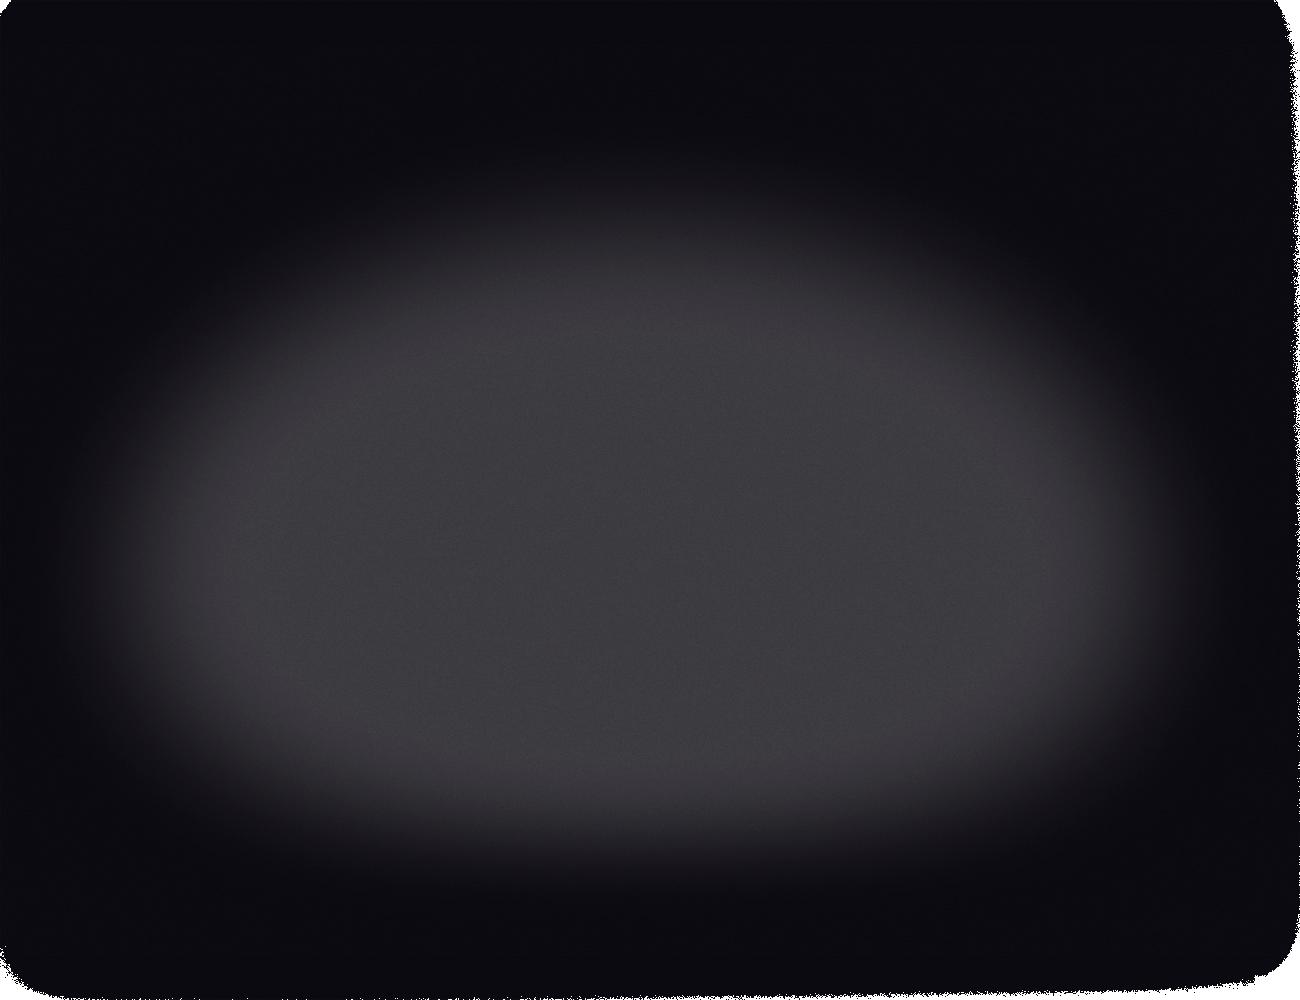 keys_trackpad_back_glow__ek482ozmnlsi_la